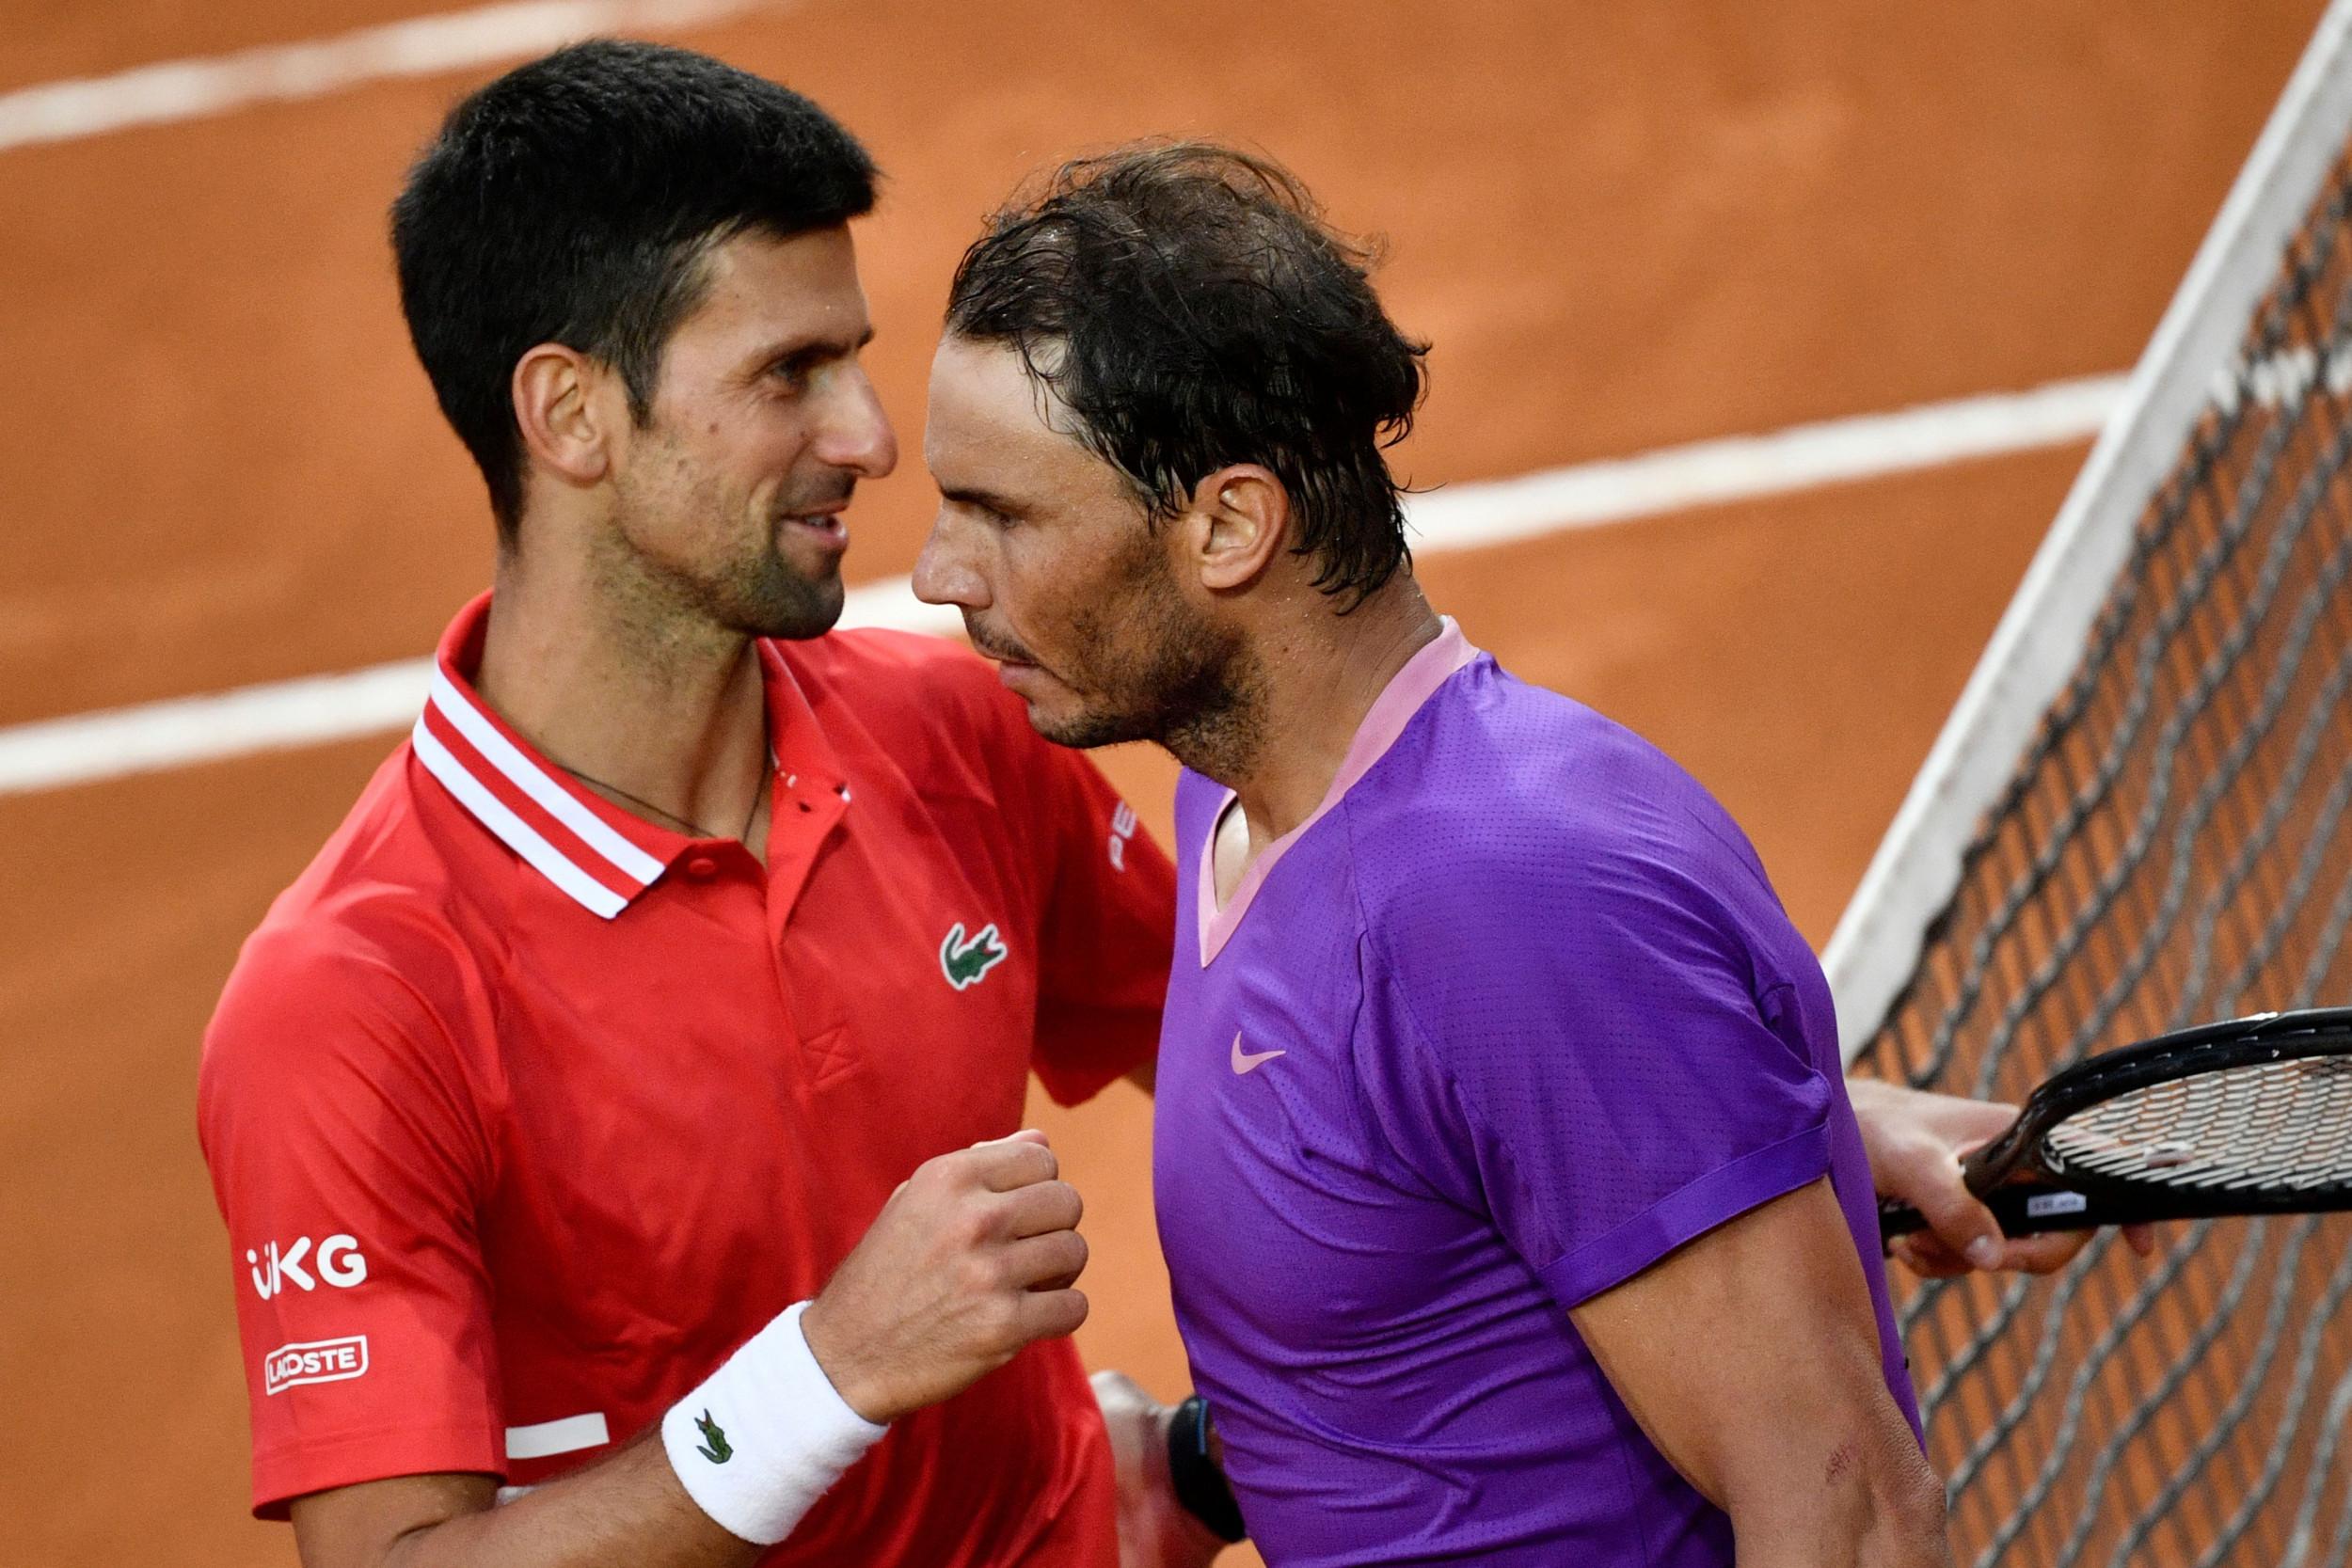 French Open 2021 How To Watch Rafael Nadal Vs Novak Djokovic Start Time Live Stream